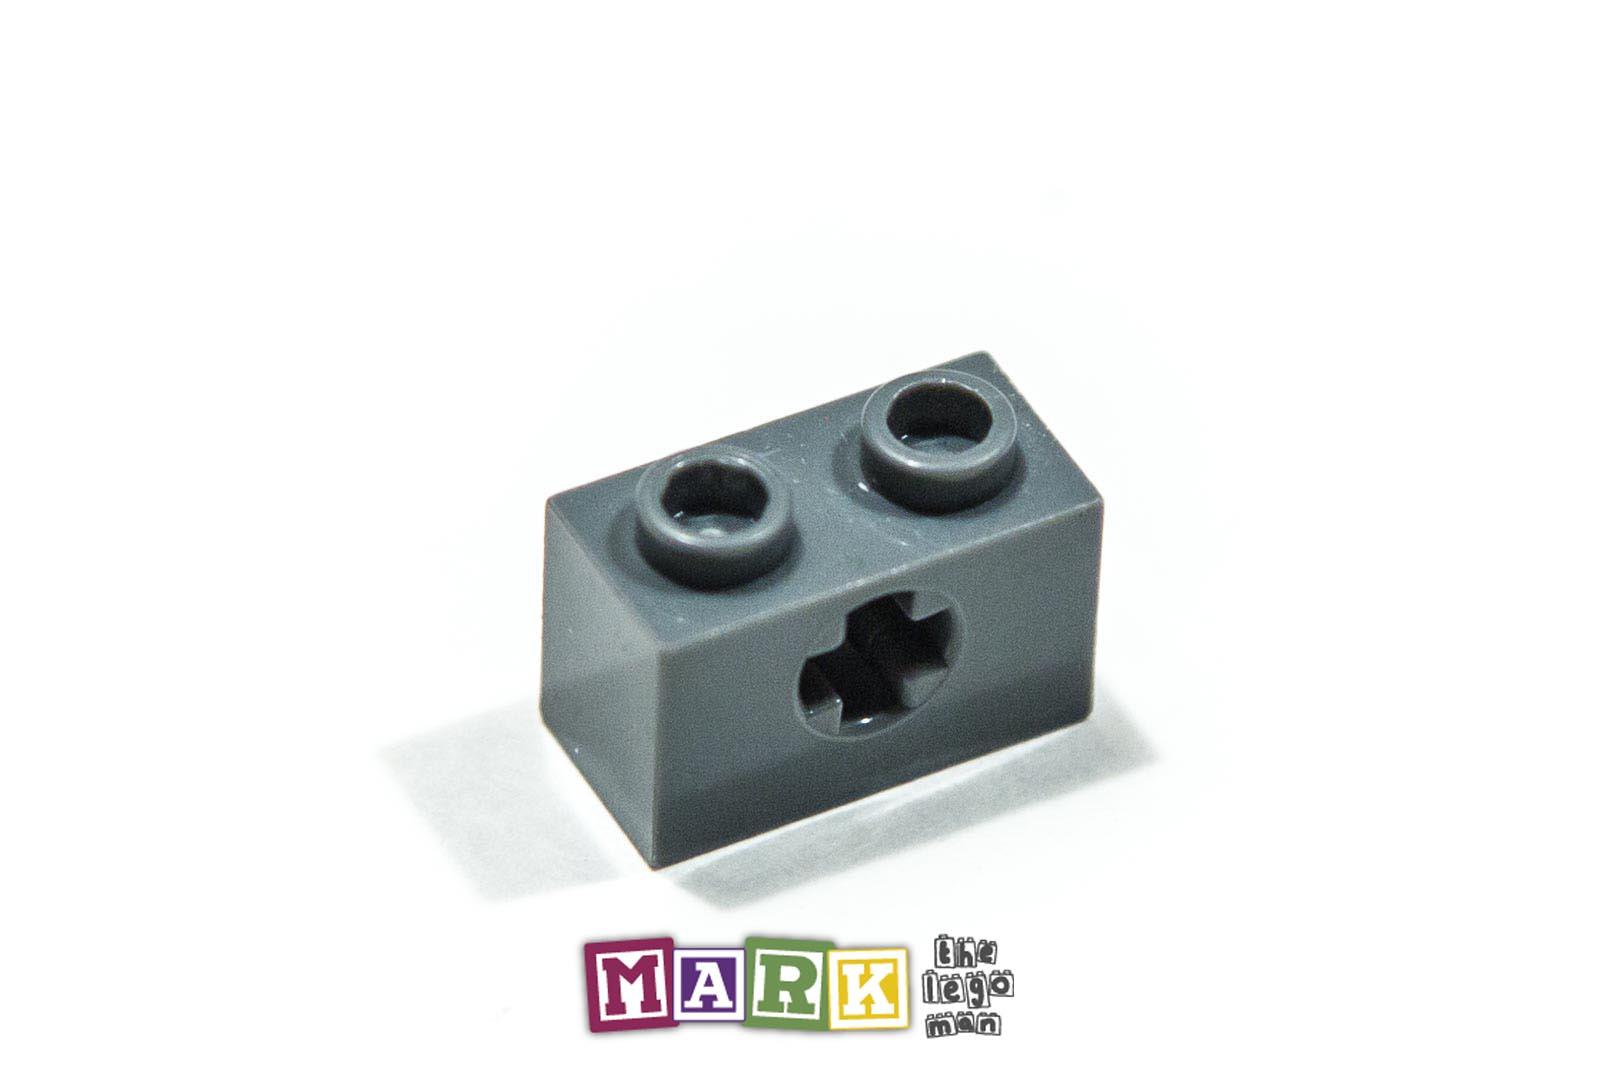 10x Black Lego Technic Brick 1 x 2 with Hole 3700